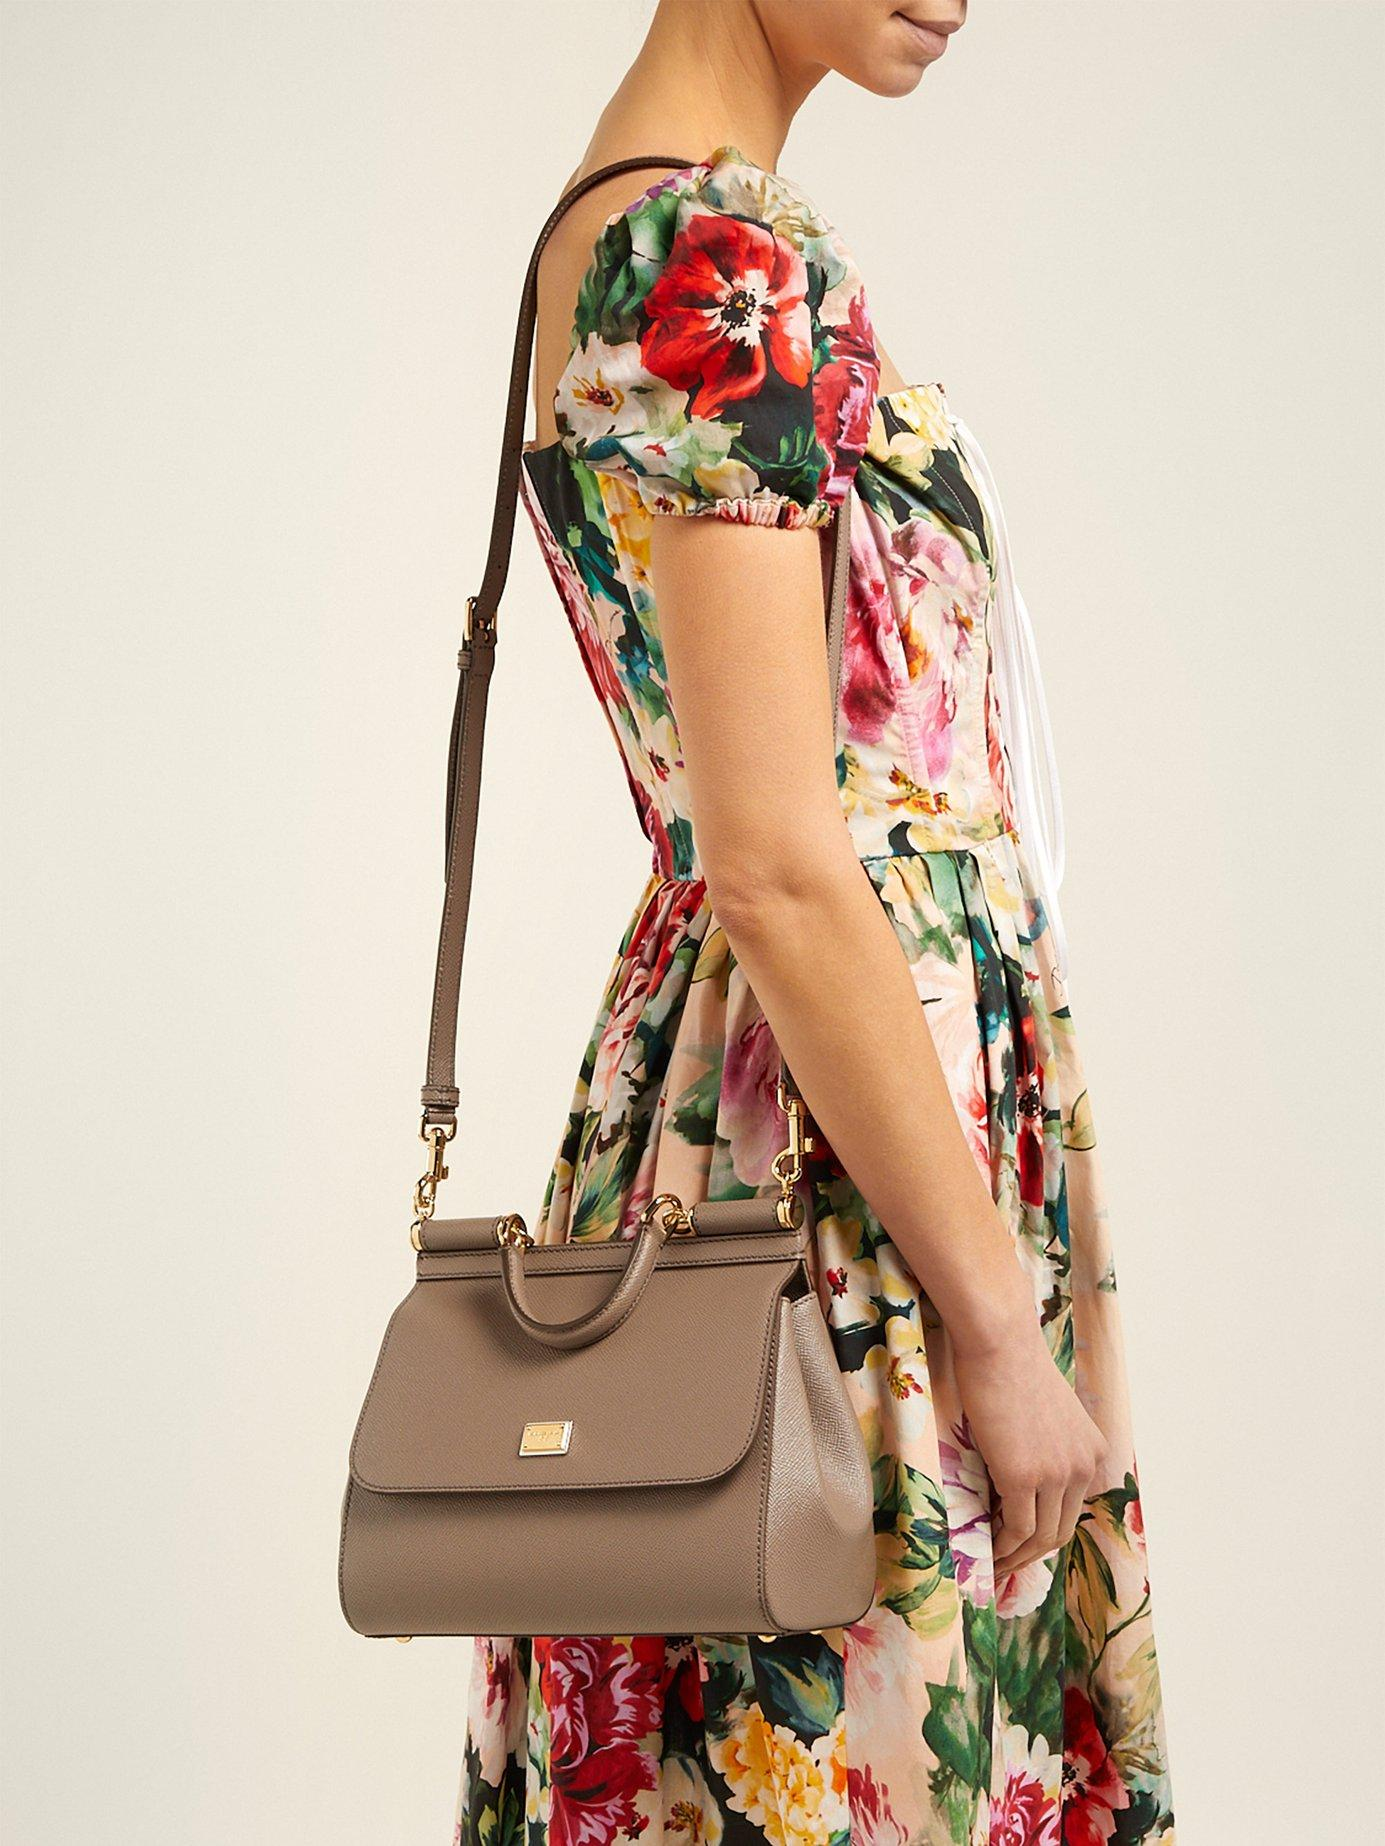 Lyst - Dolce   Gabbana Sicily Medium Dauphine Leather Bag in Gray e2e94f9193a5c